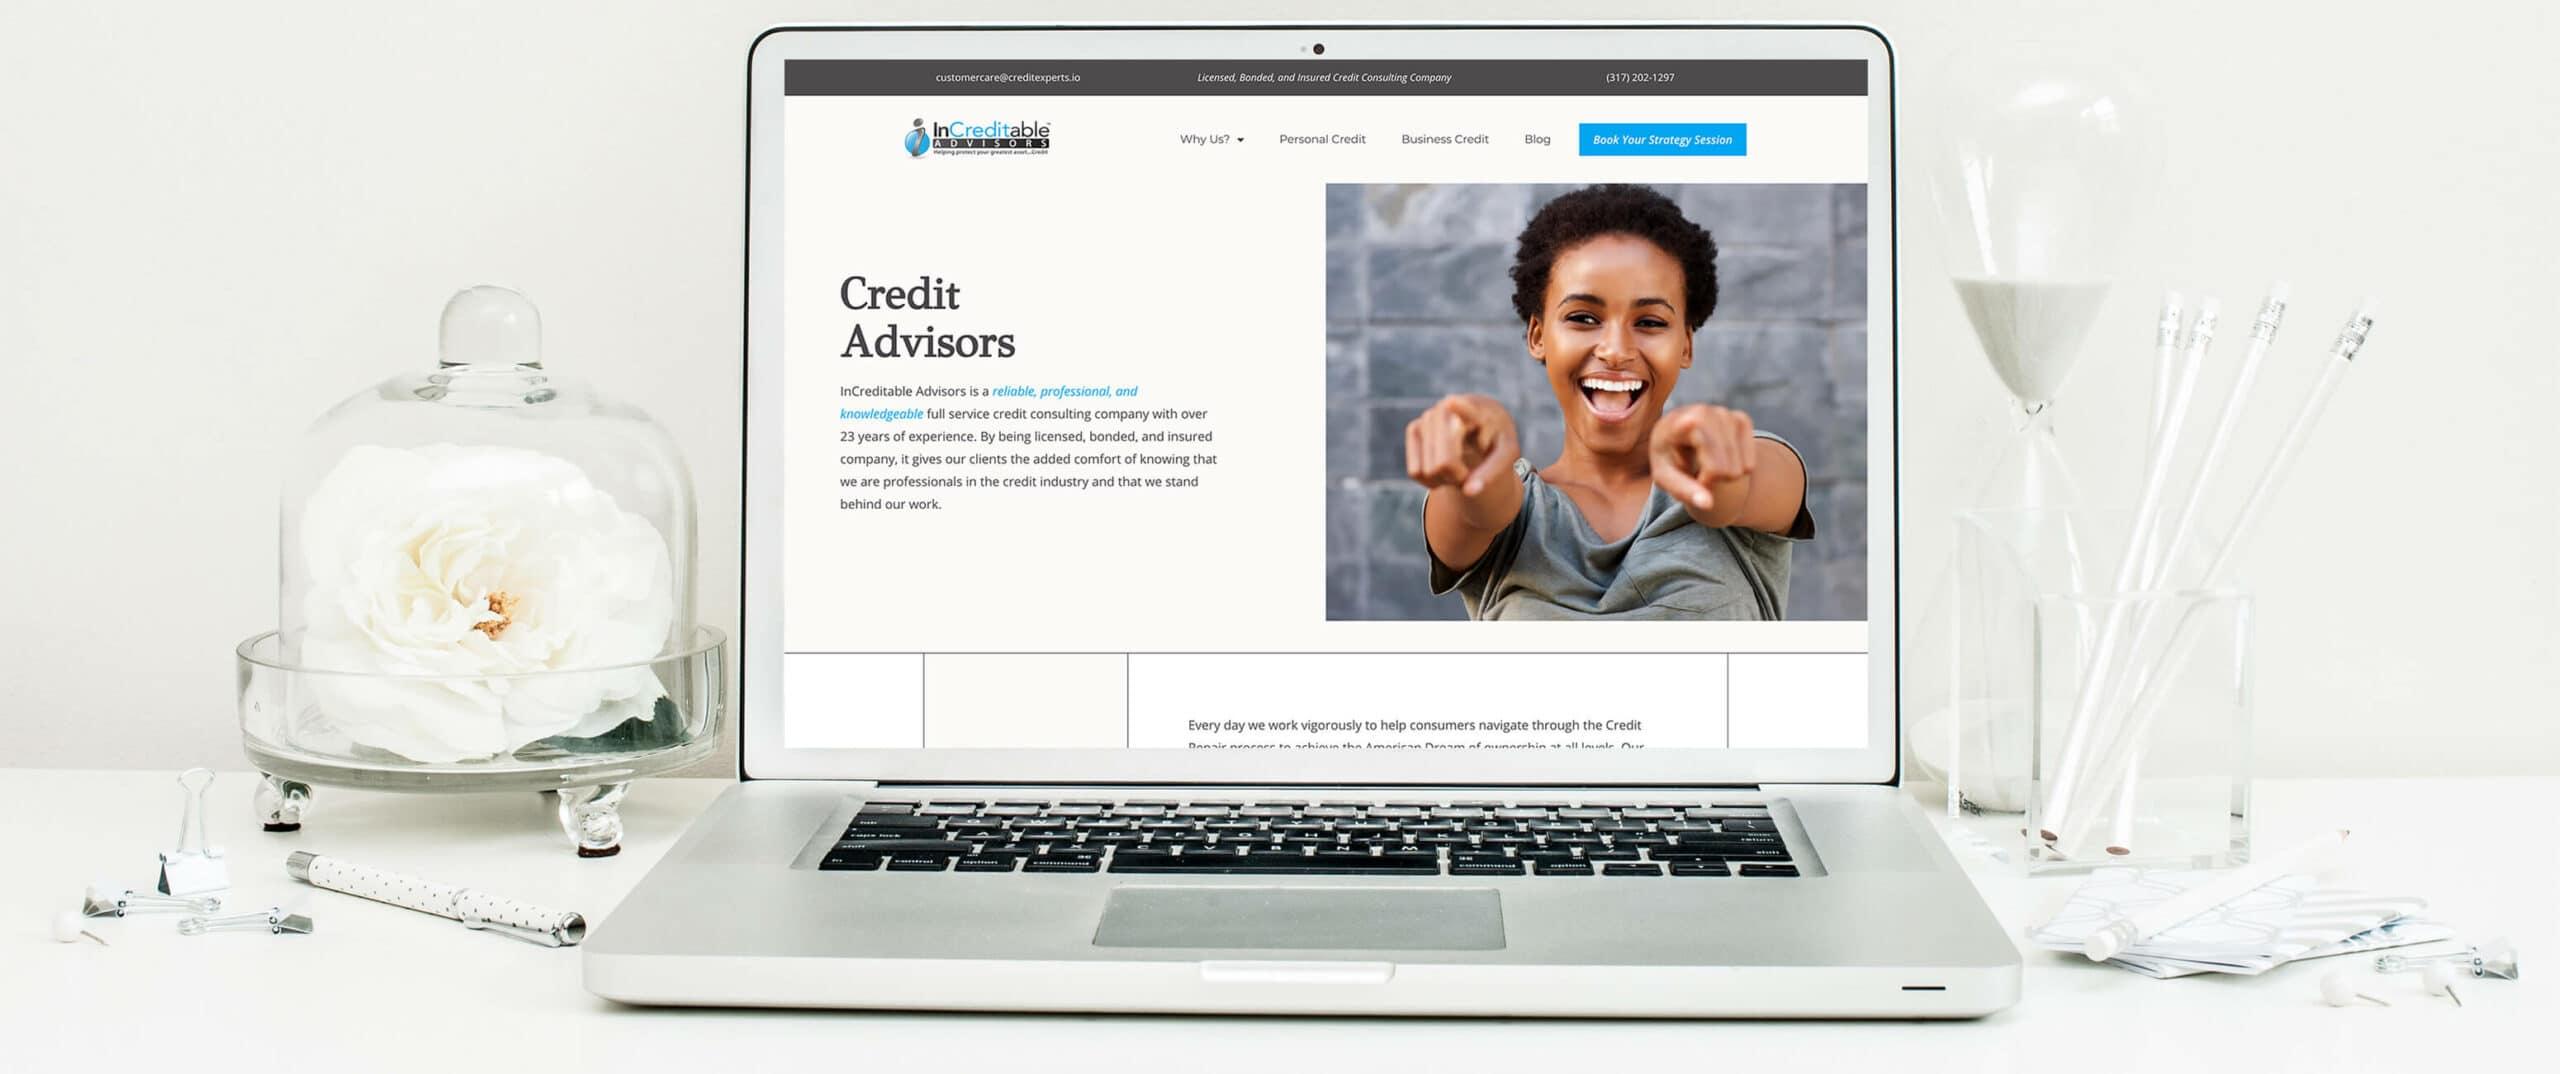 Increditable Advisors - A Financial Company Website Desktop view of website